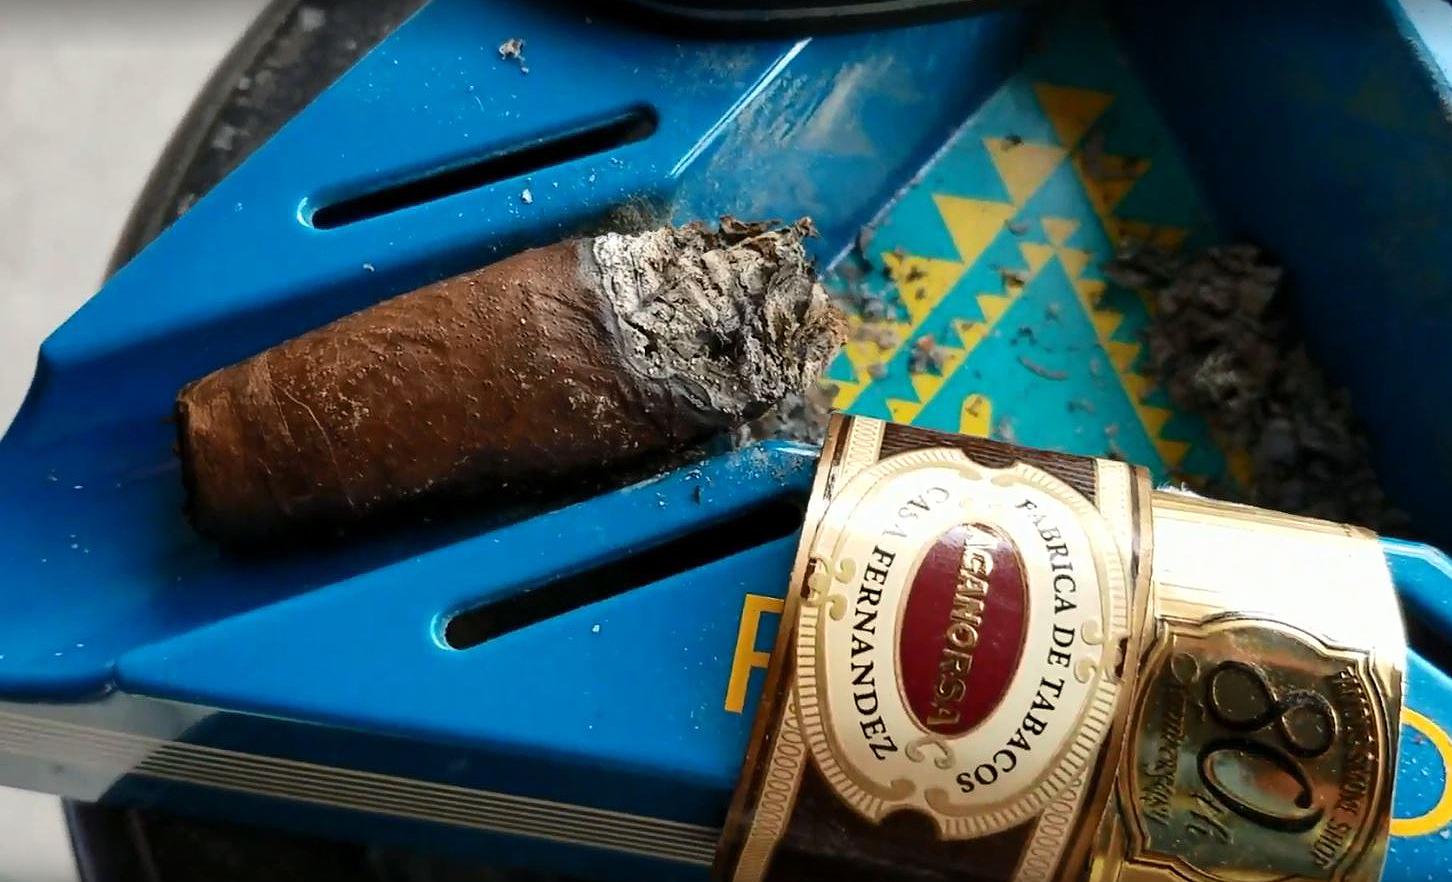 nowsmoking Aganorsa Leaf Famous Smoke Shop 80th Anniversary Toro cigar review by Gary Korb nub